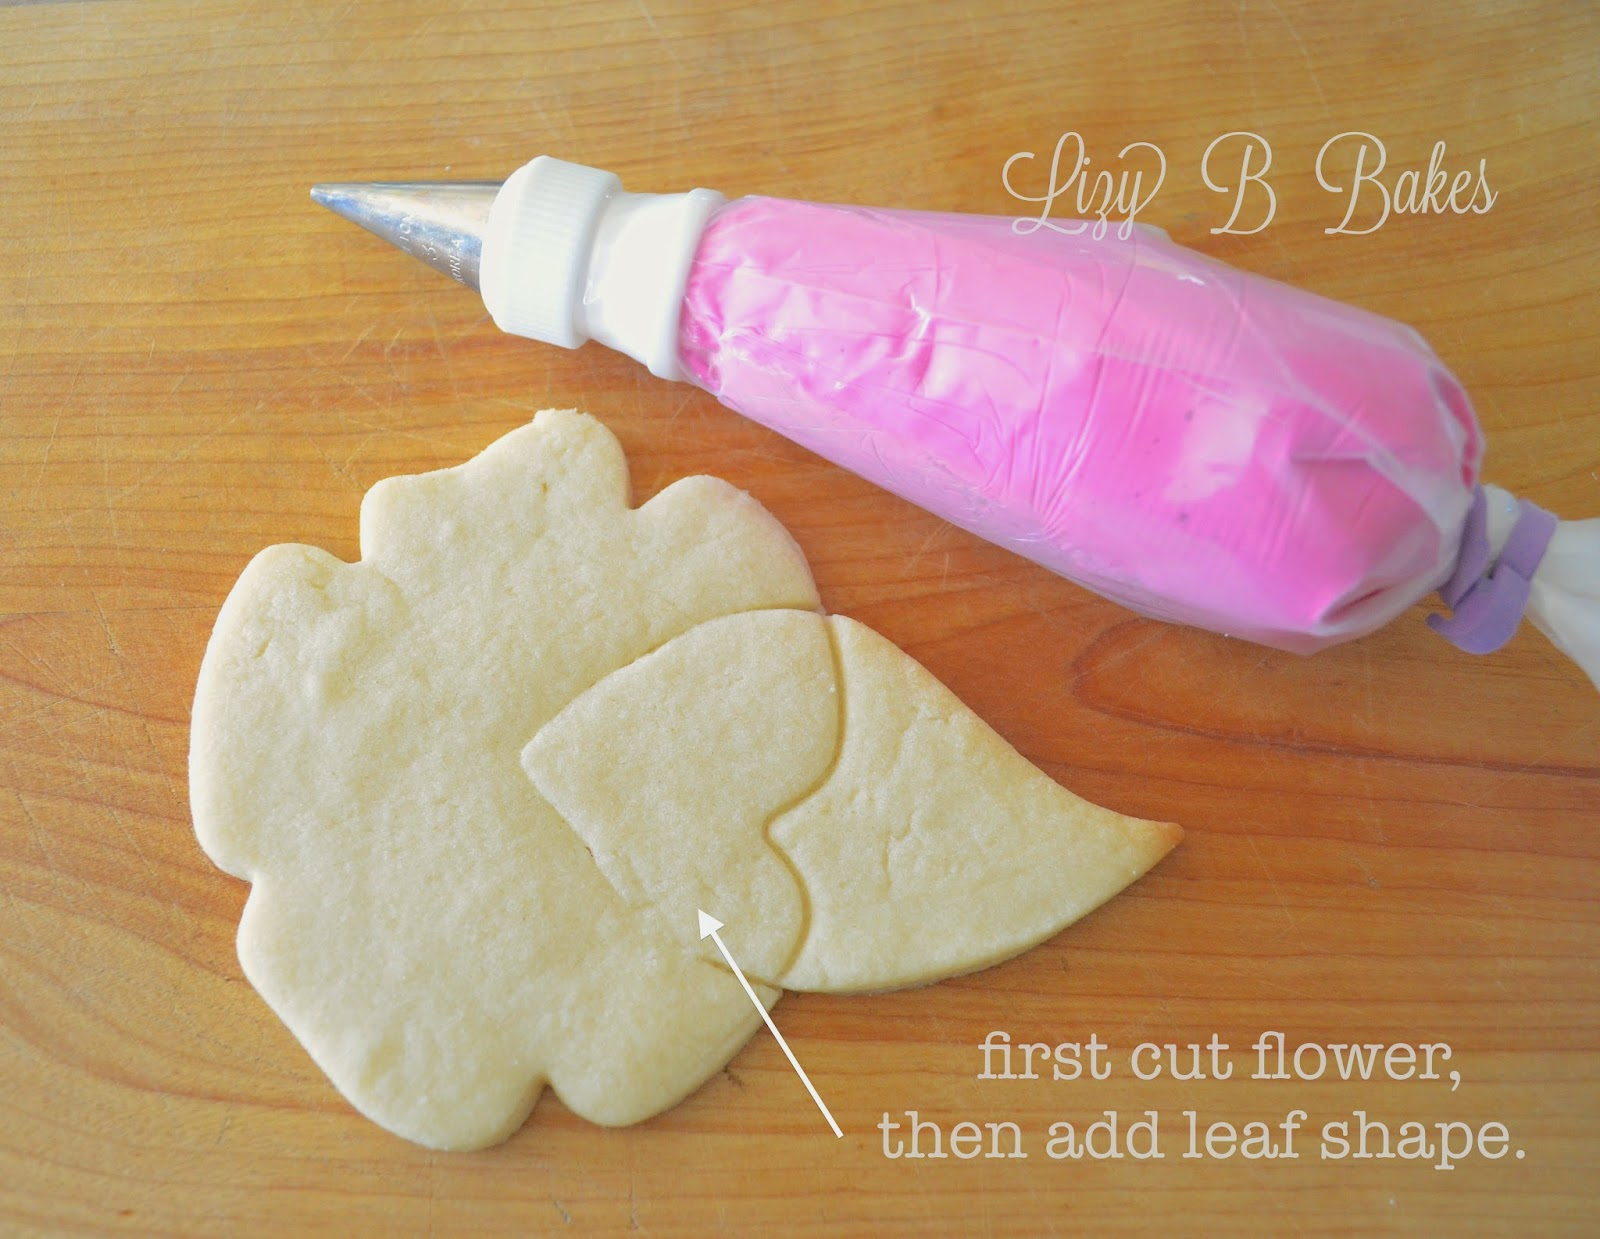 Lizy b hibiscus cookie tutorial monday may 19 2014 izmirmasajfo